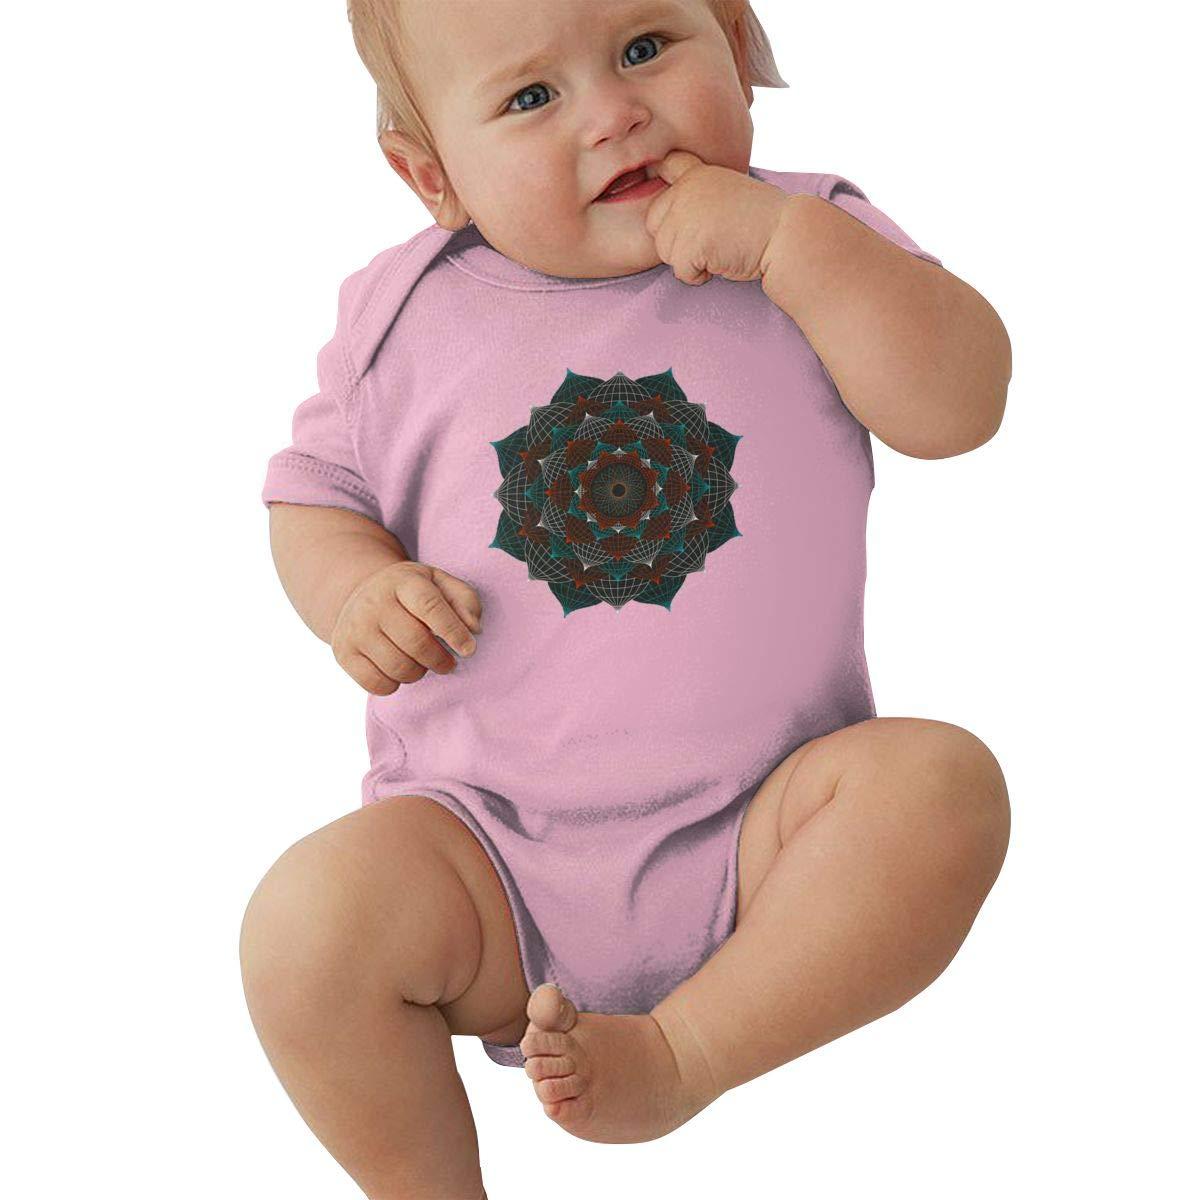 Mri-le2 Newborn Baby Short Sleeve Organic Bodysuits L.O.T.U.S Baby Clothes